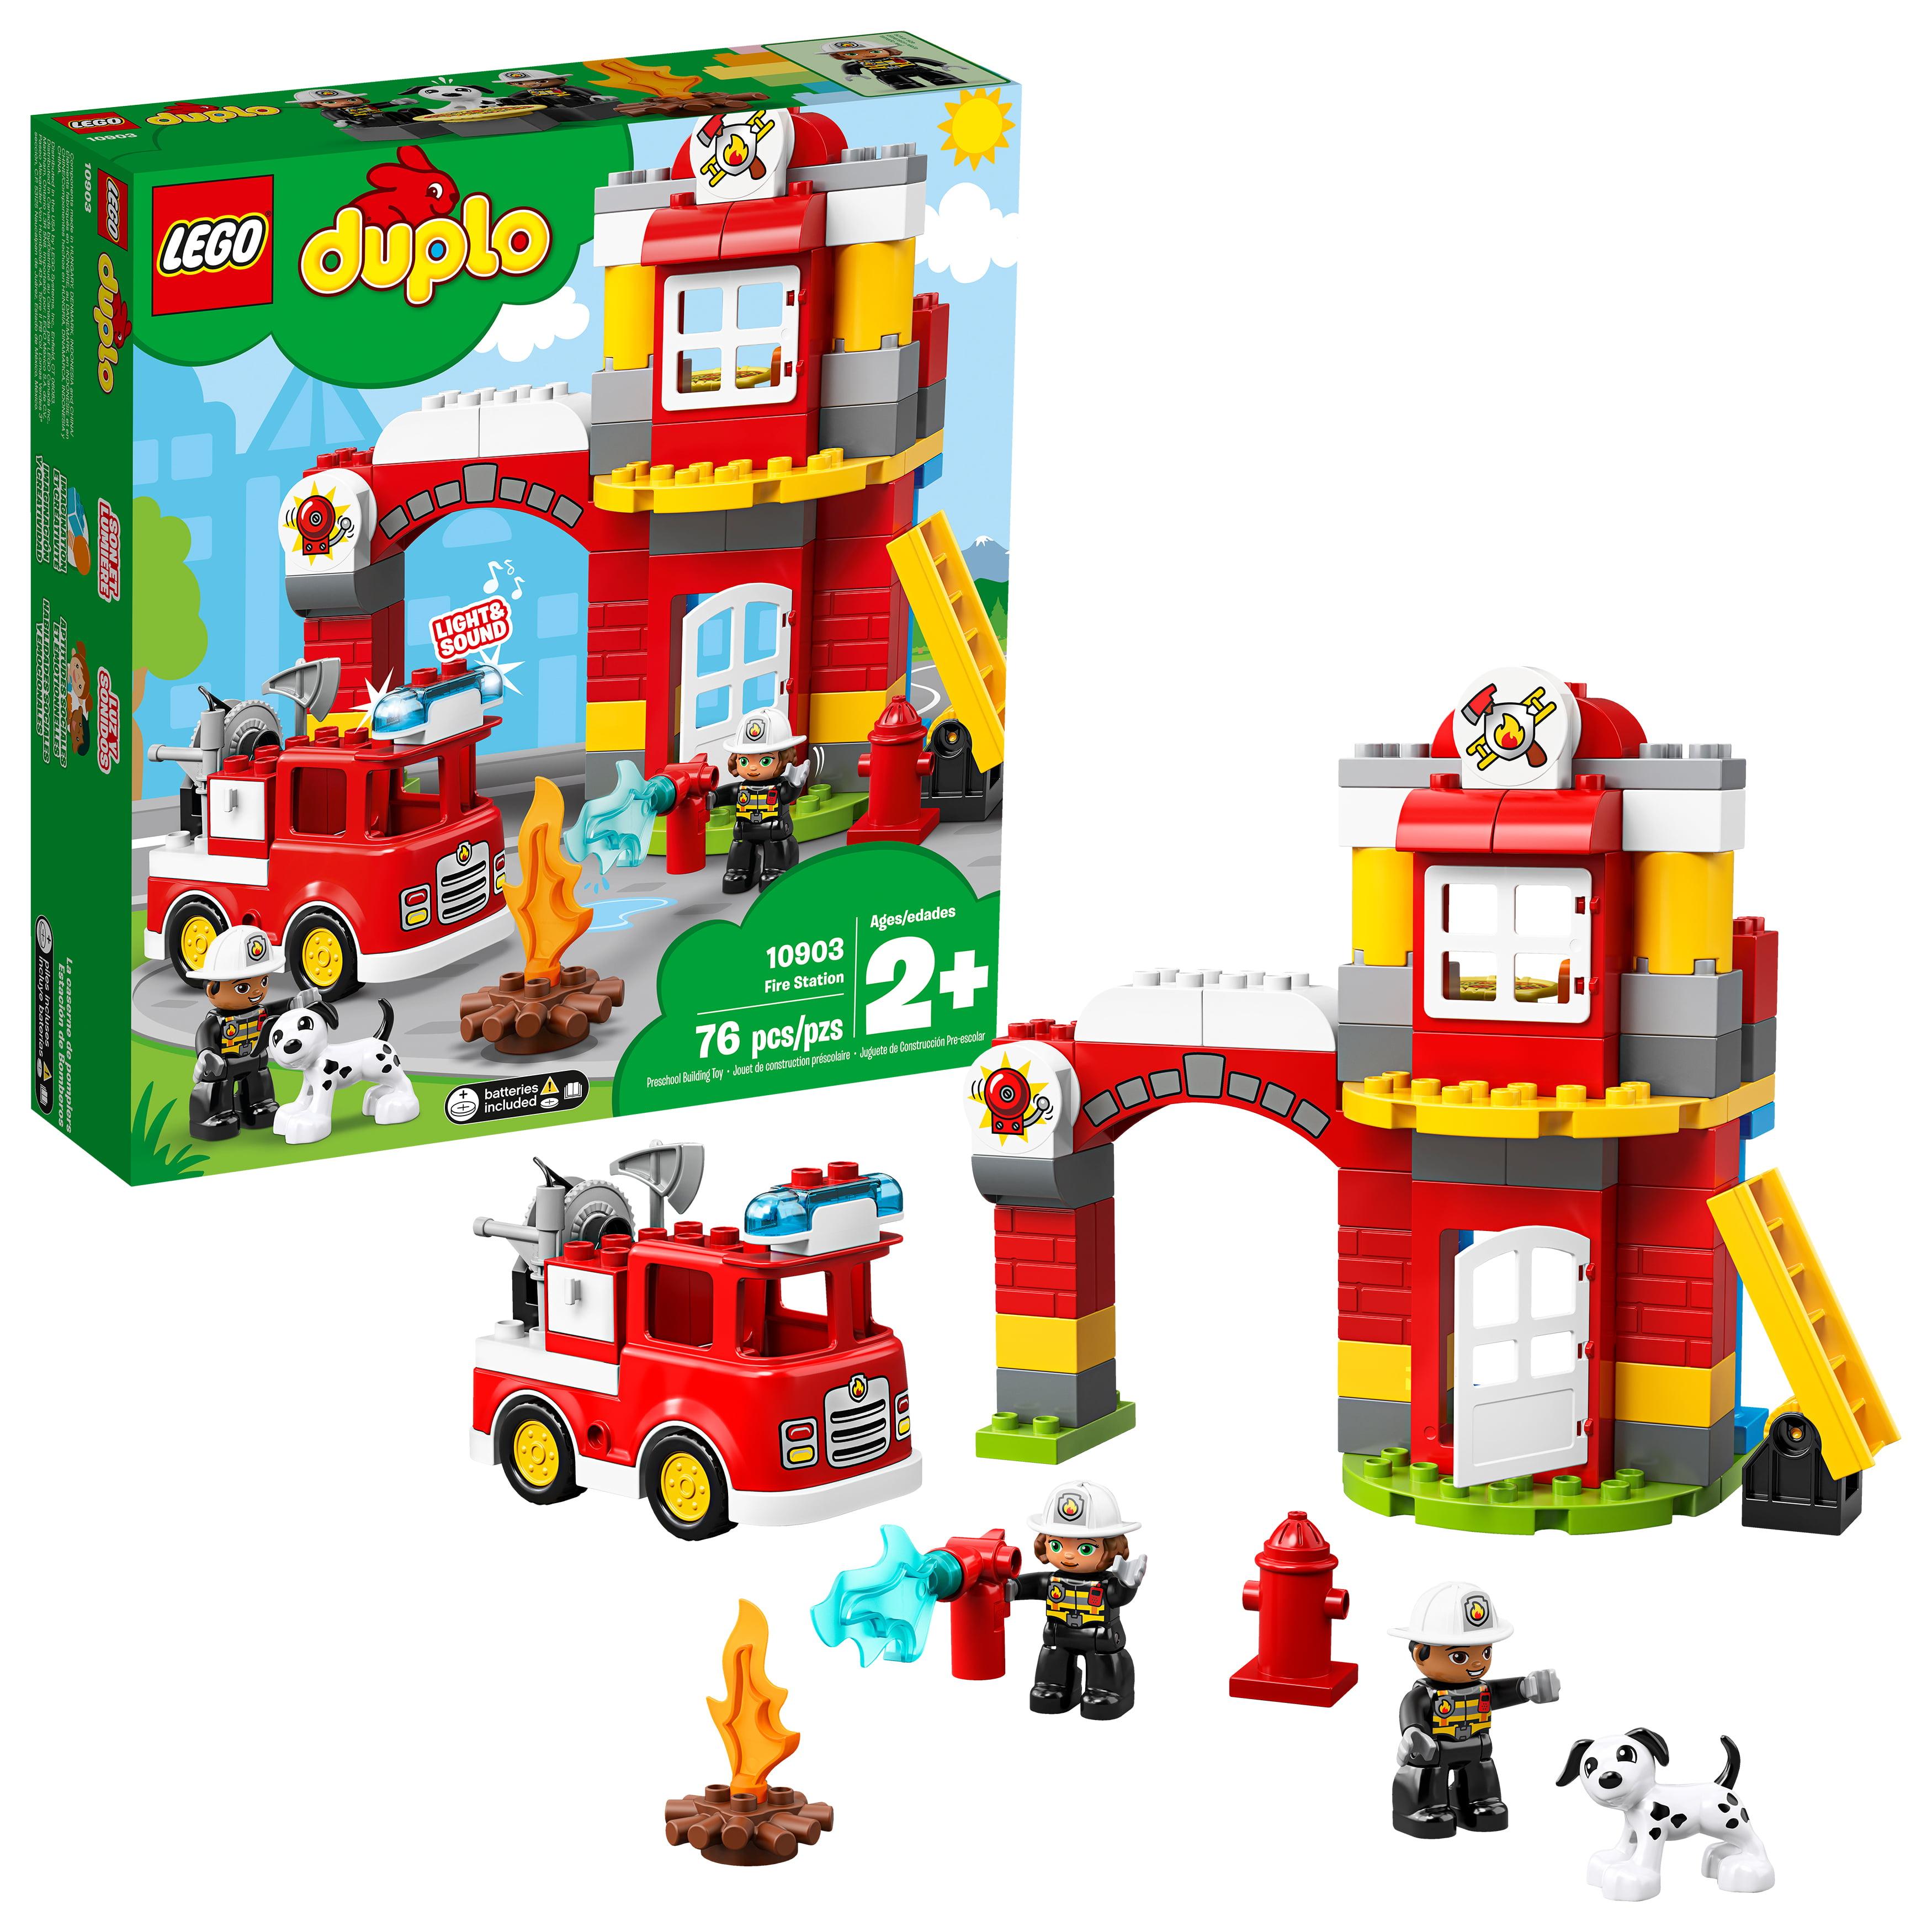 Lego DUPLO Town Fire Station 10903 Preschool Building Set by LEGO System Inc